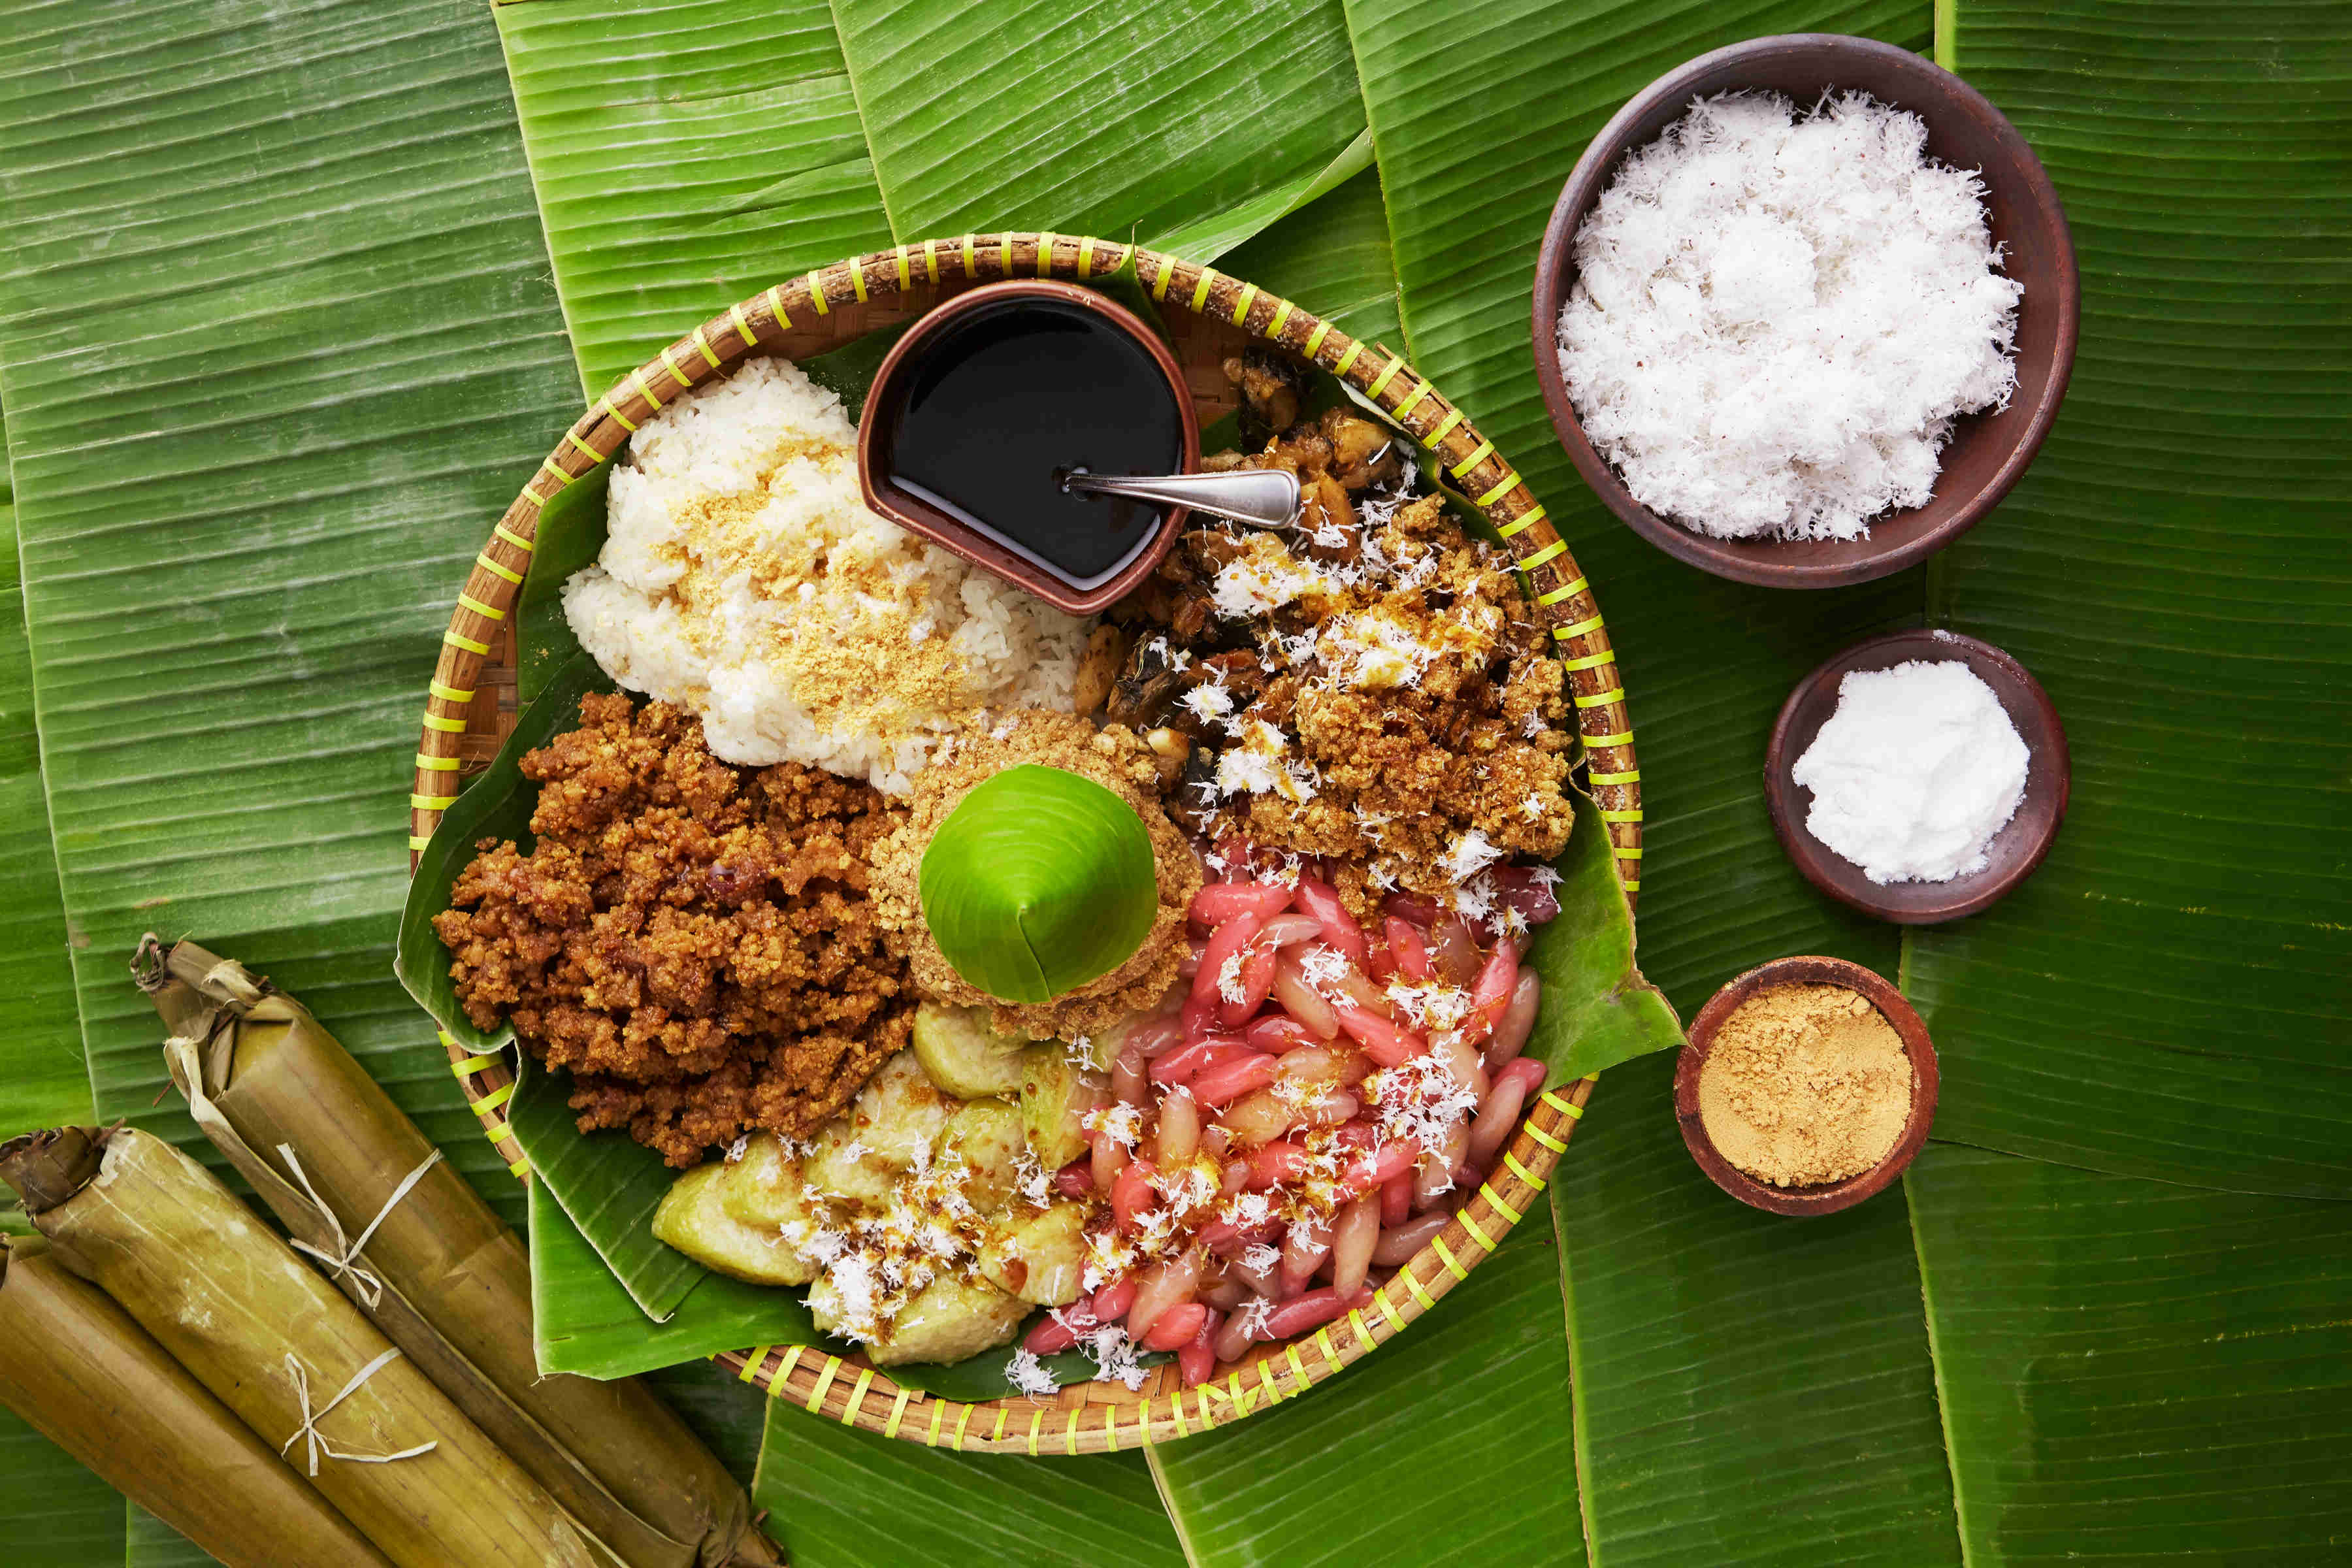 Jajan Pasar, prato típico da Indonésia